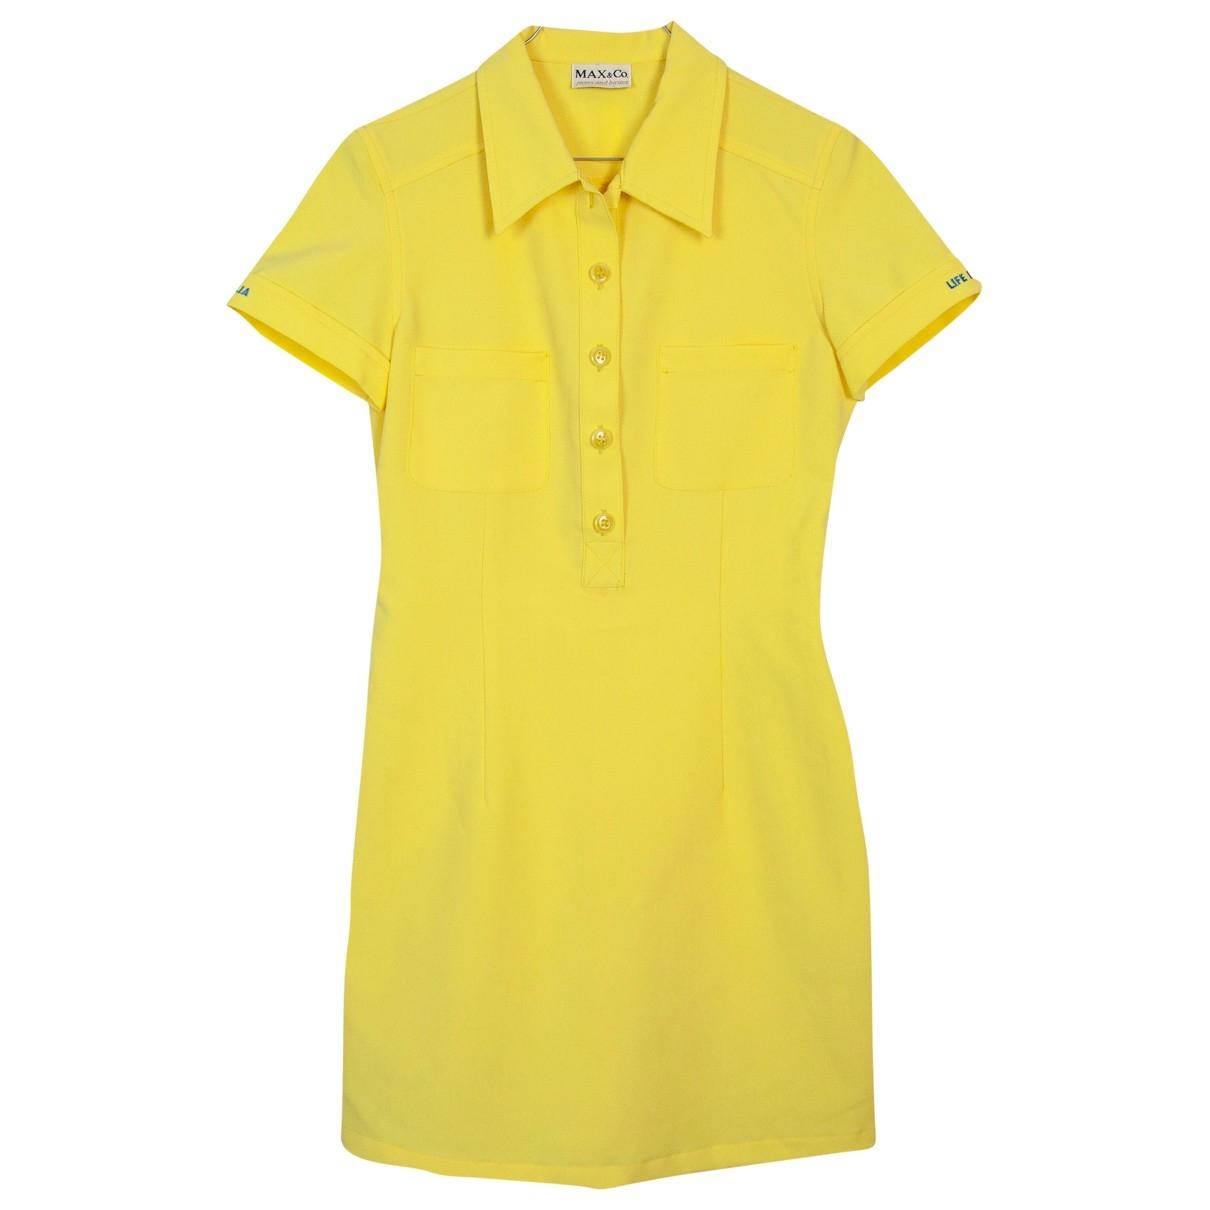 Max & Co \N Kleid in  Gelb Polyester